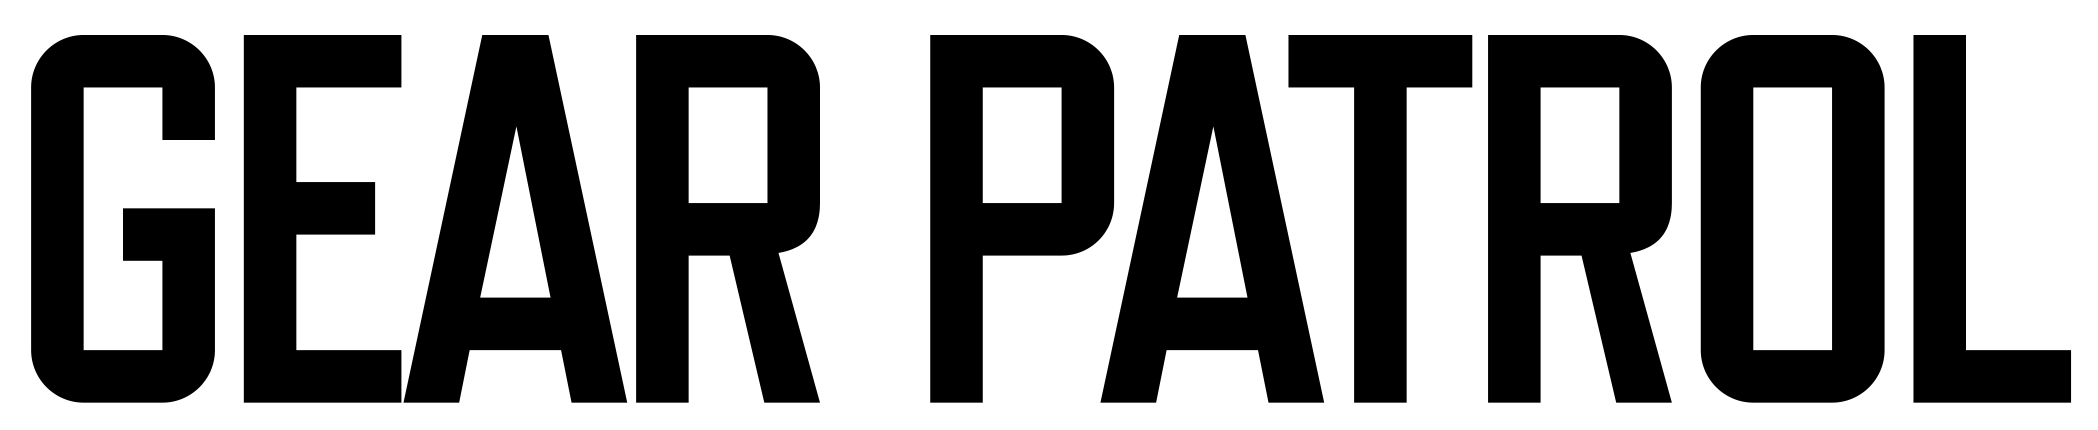 gear patrol logo.png